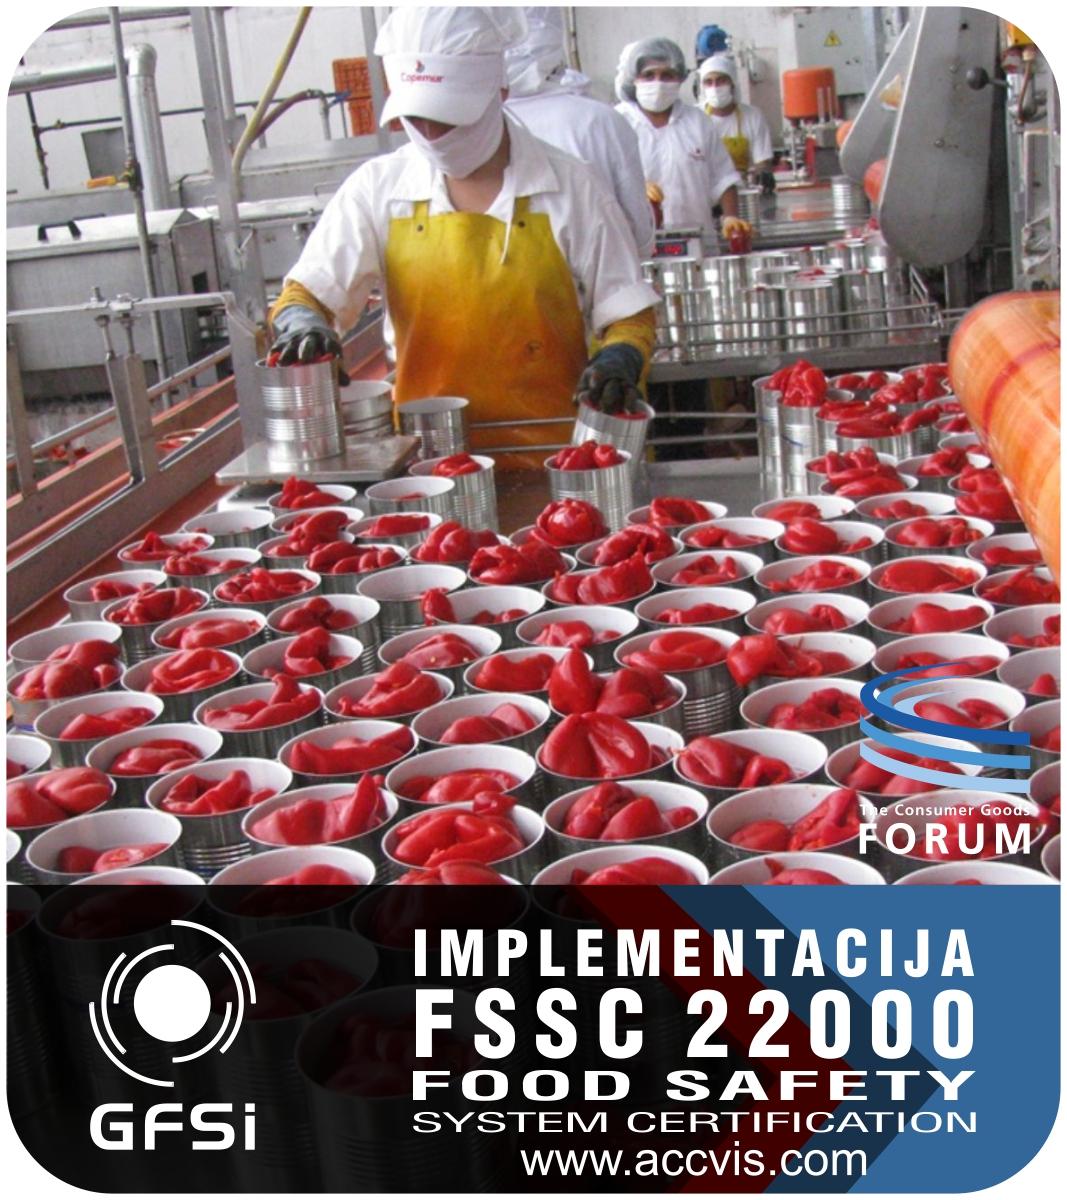 Uvodjenje standarda FSSC 22000